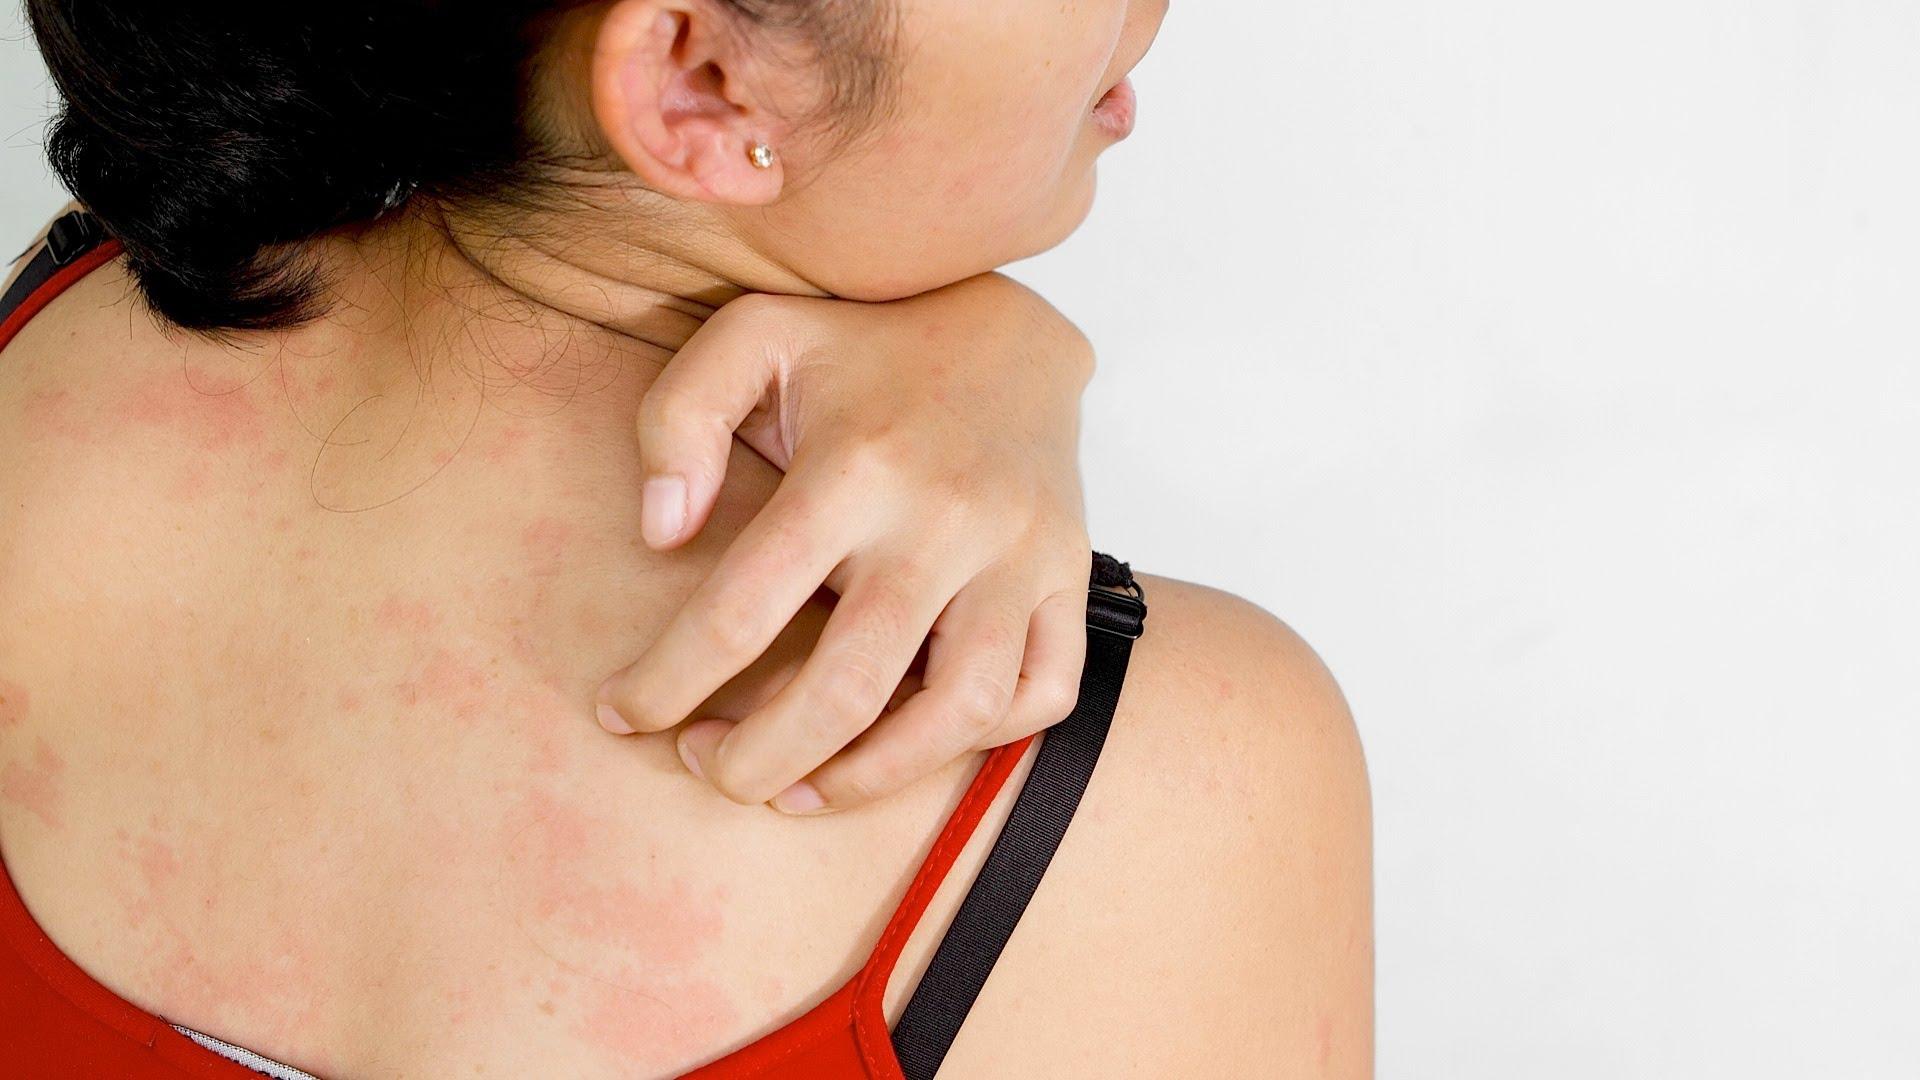 skin-itchiness